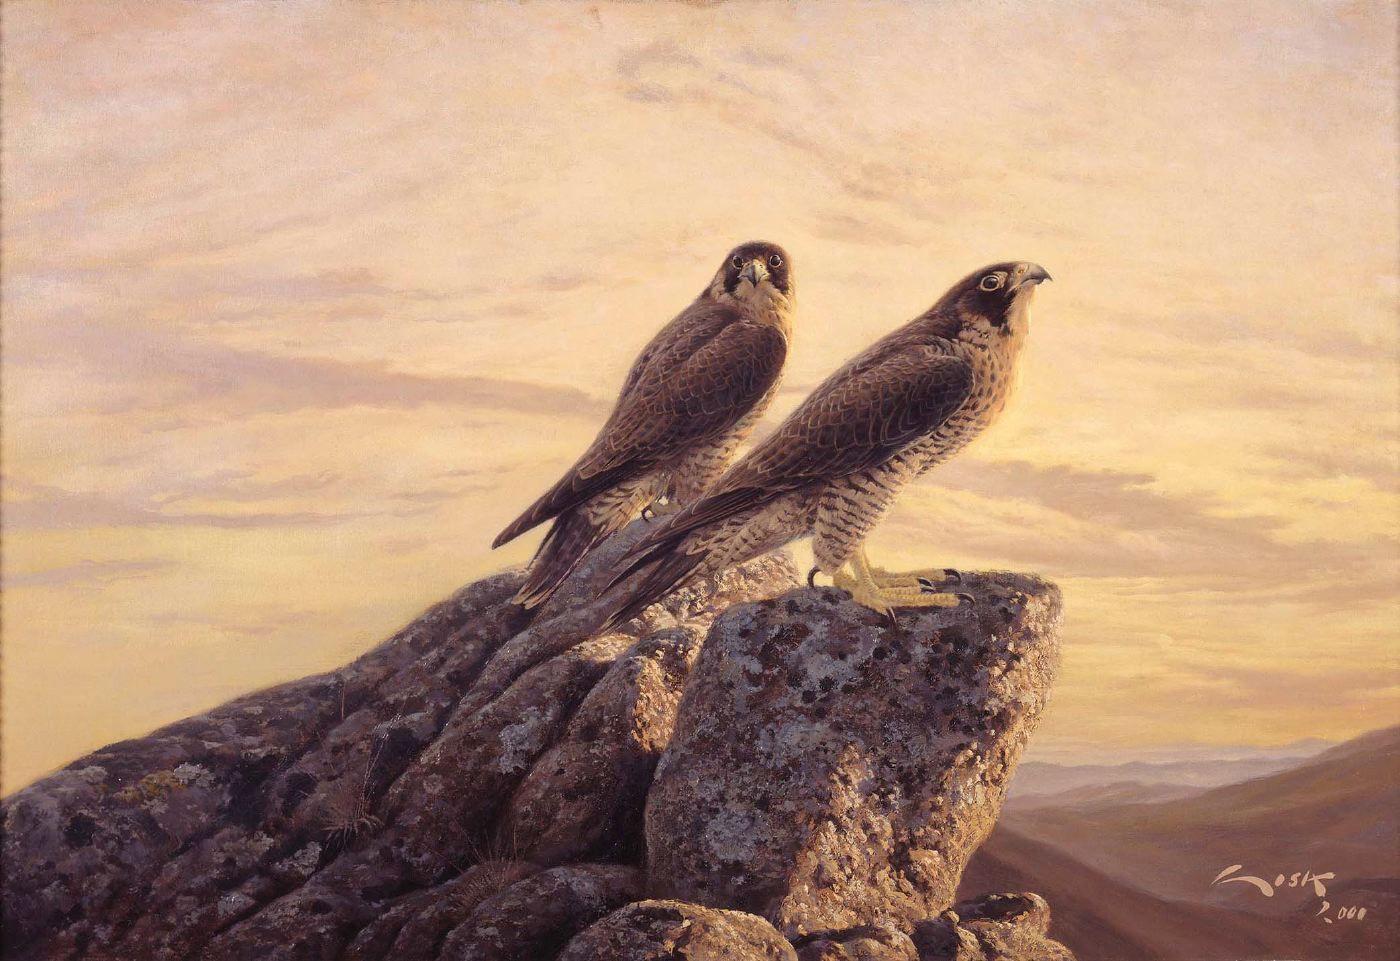 Halcon peregrino | Falcons art - رســـم صقـــور | Pinterest ...